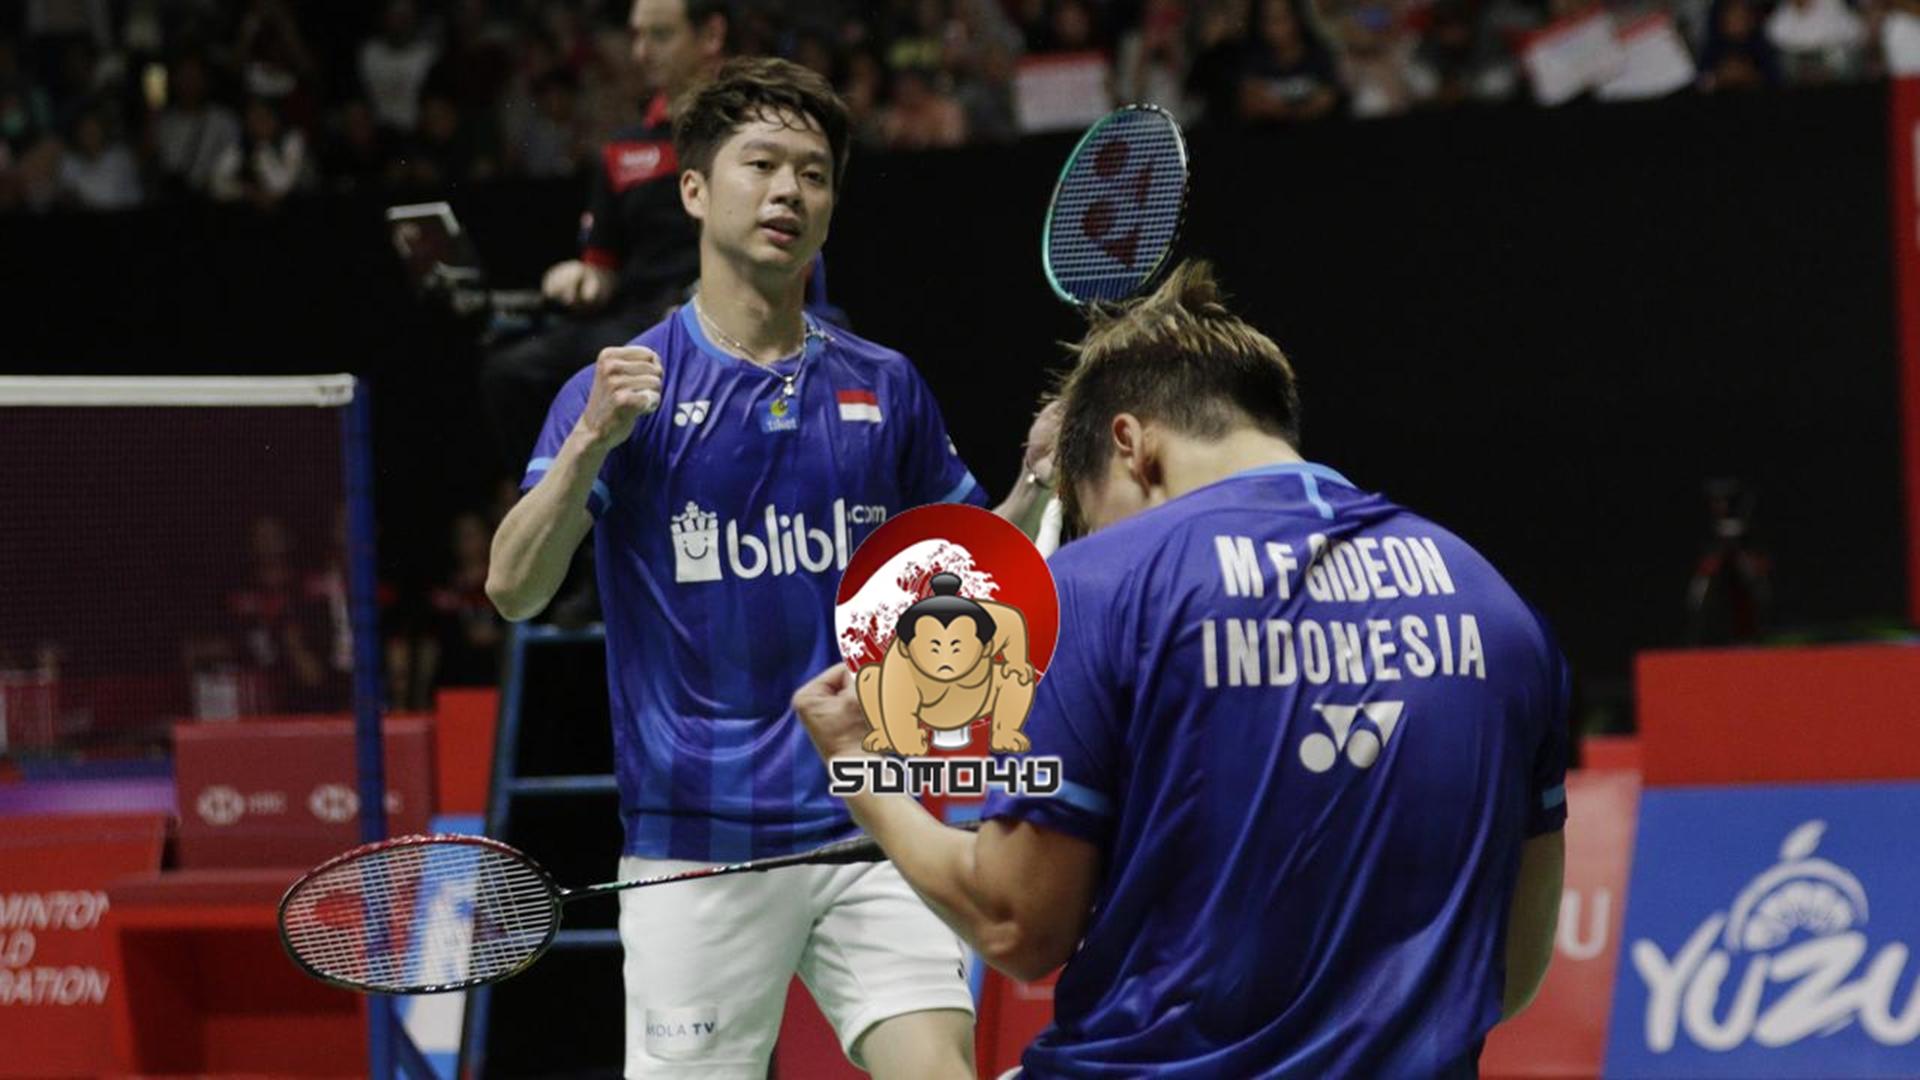 Ketika Fans Cuek Saat Bertemu Kevin Sanjaya